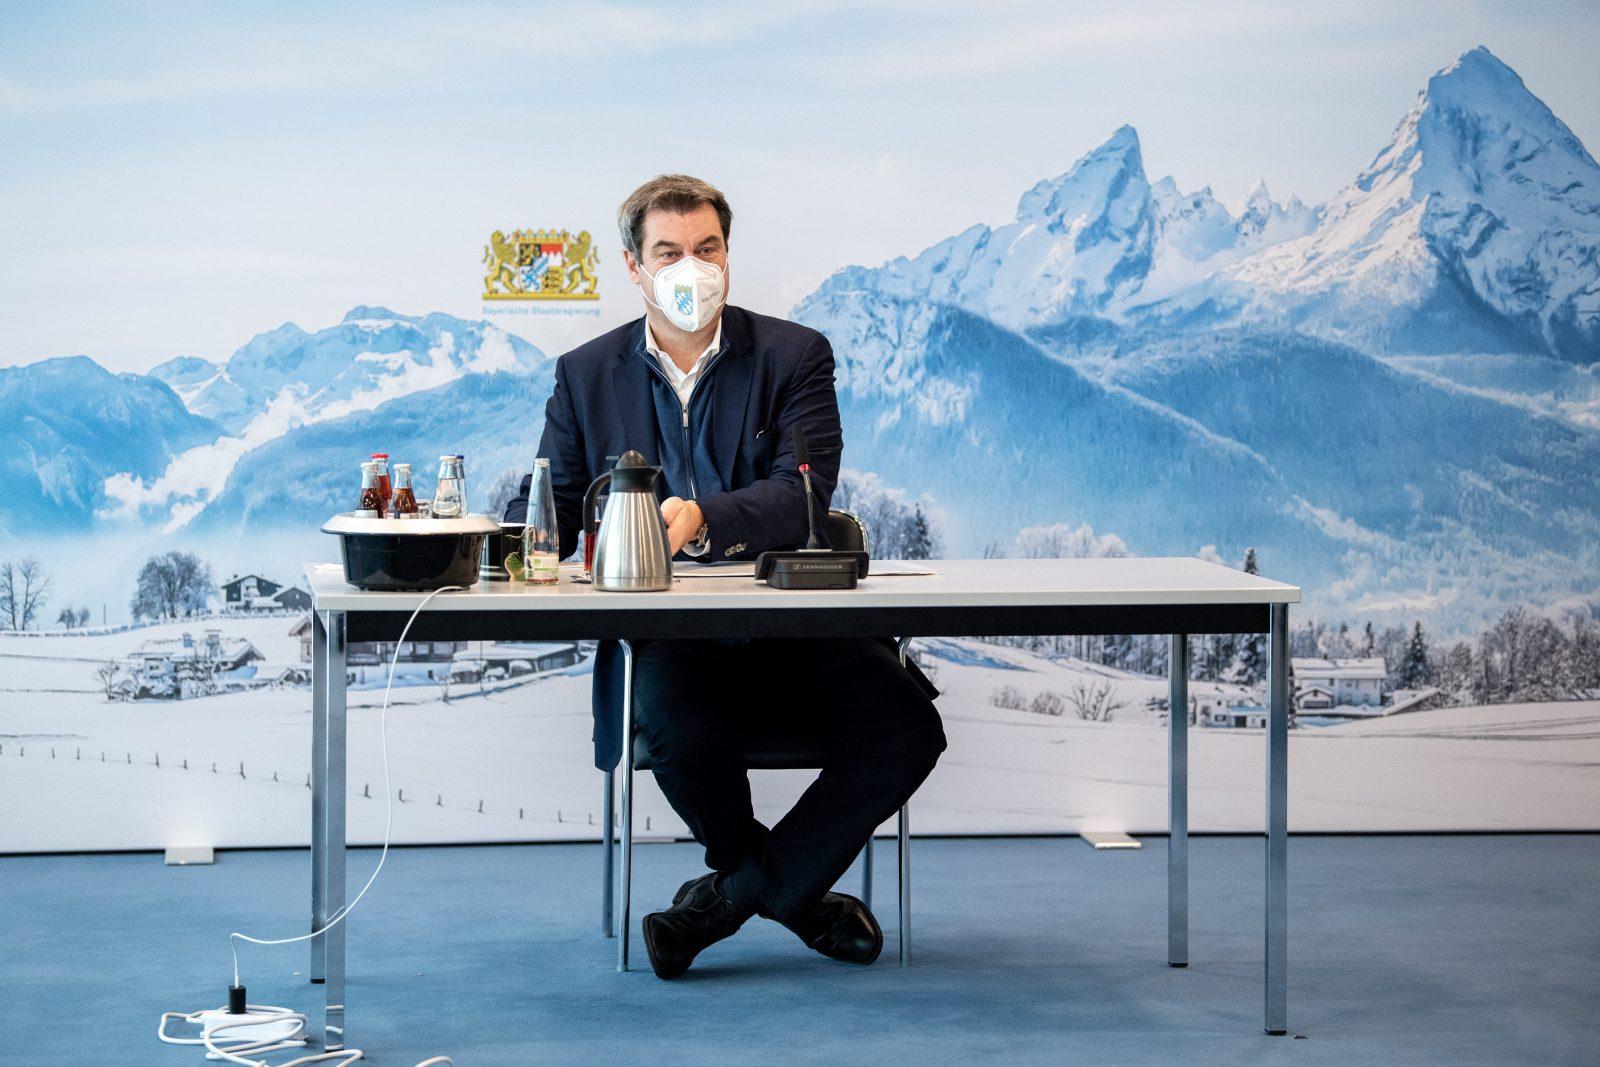 Bayerns Ministerpräsident Markus Söder (CSU) verhängt immer neue Corona-Maßnahmen Foto: picture alliance/dpa/dpa-POOL | Matthias Balk